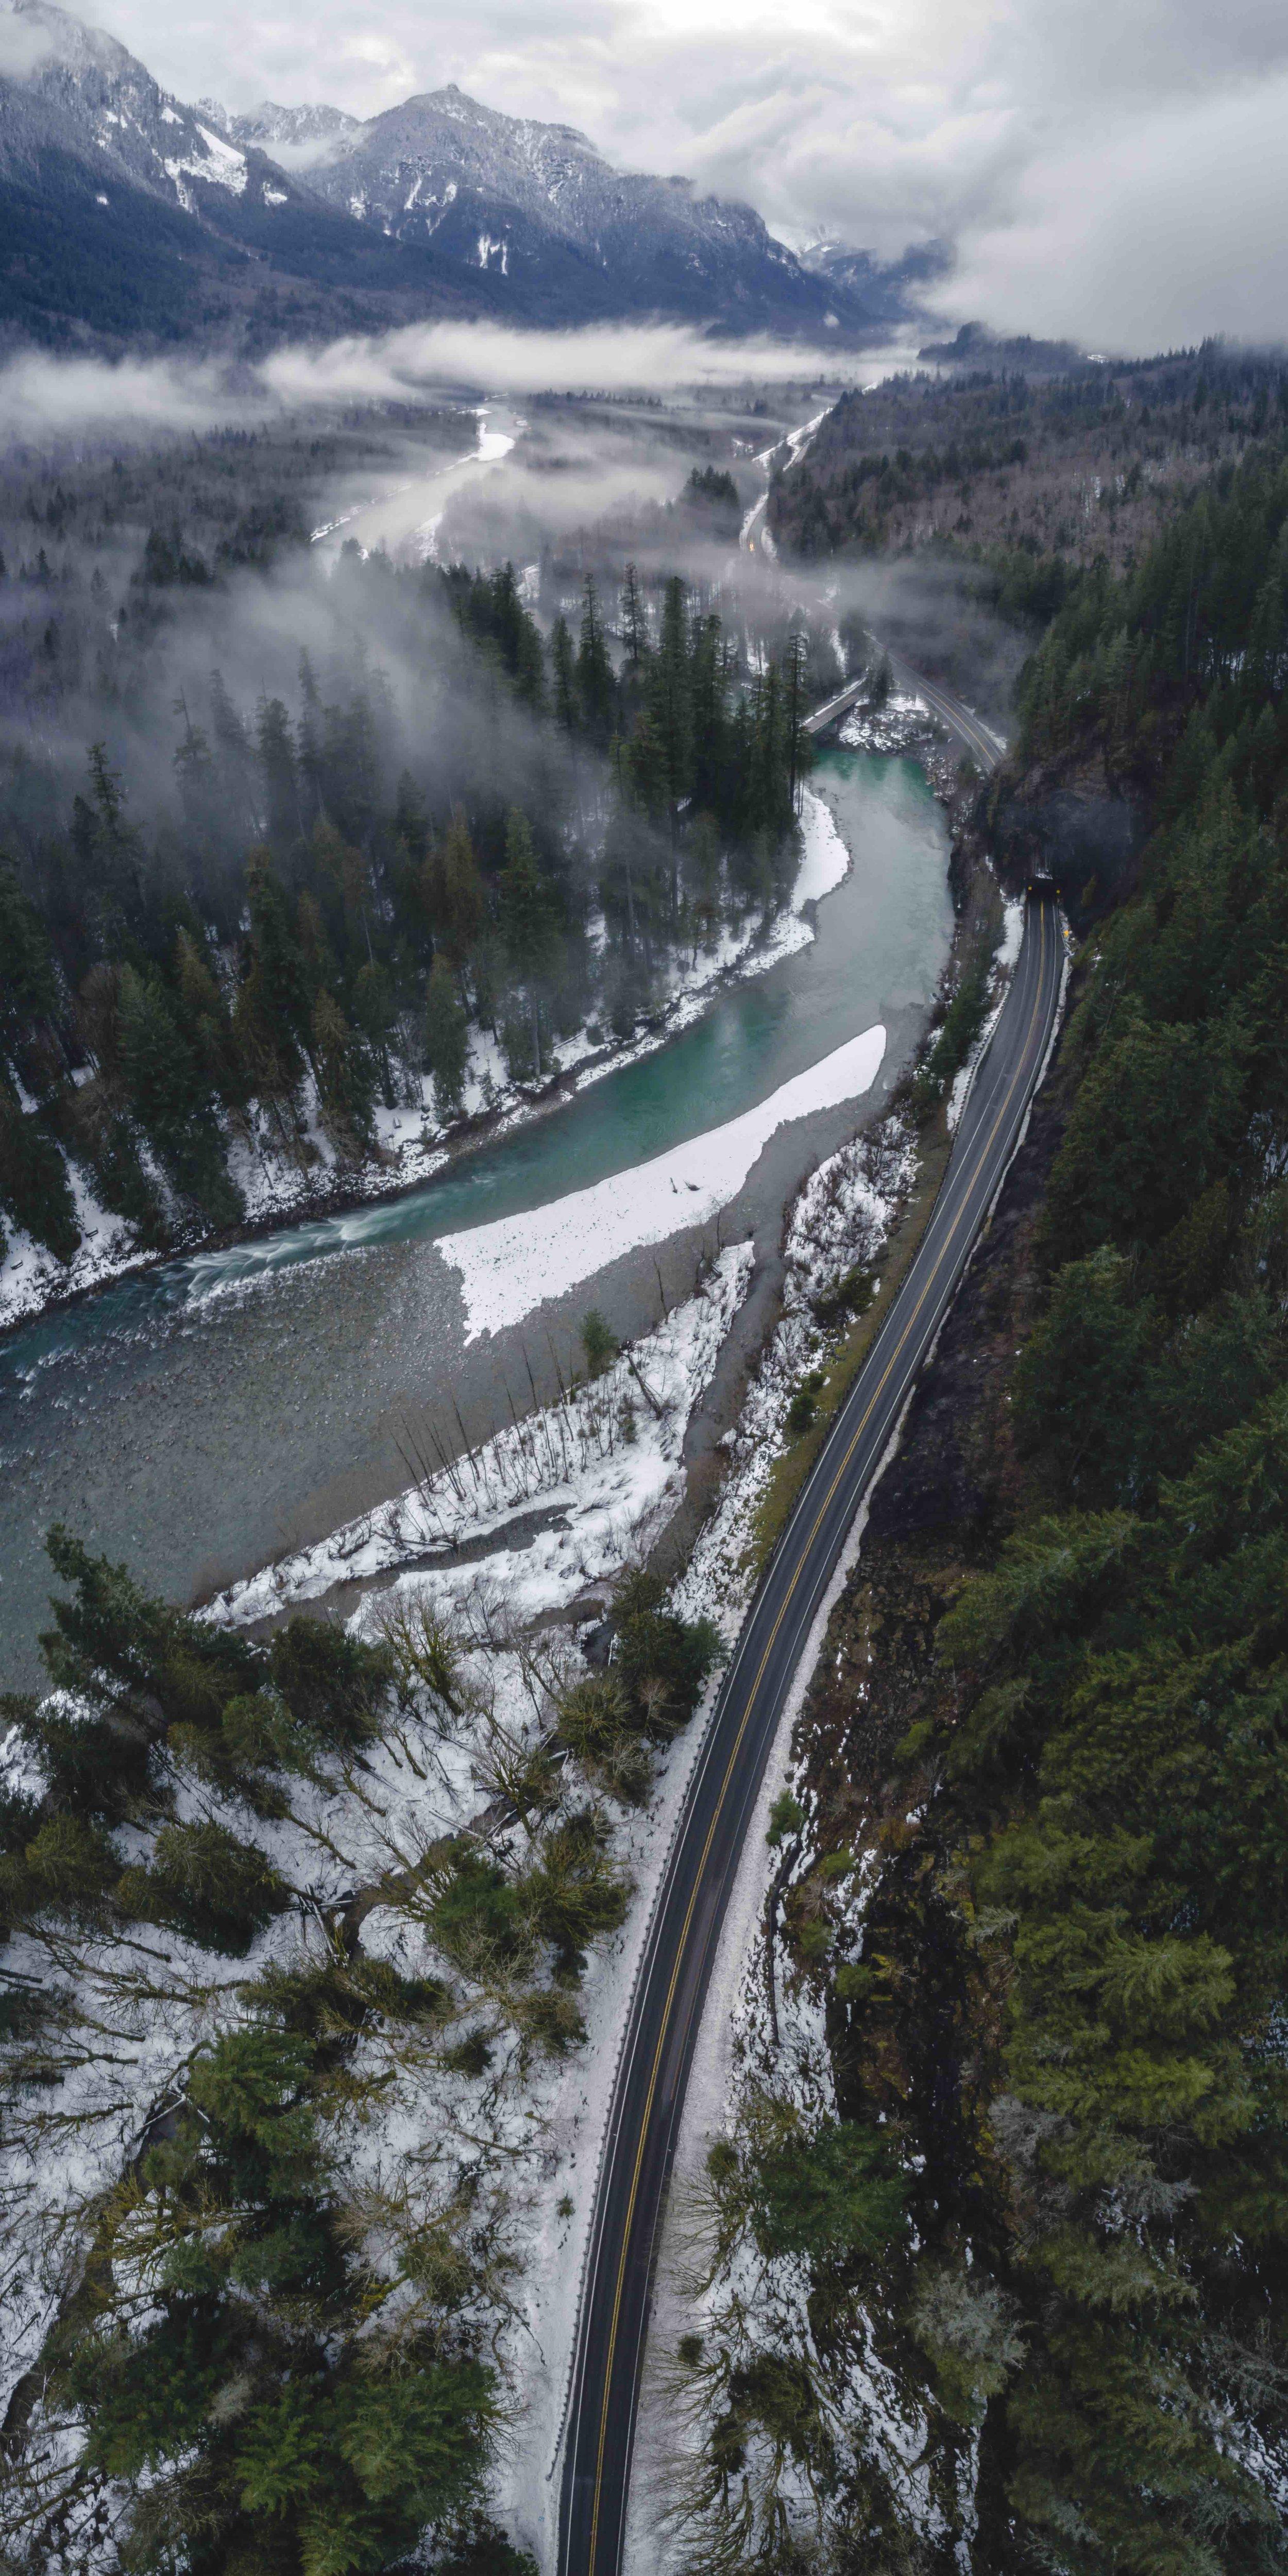 Pacific_Northwest_Nature_Highway_Vertical_Panorama_Portrait.jpeg